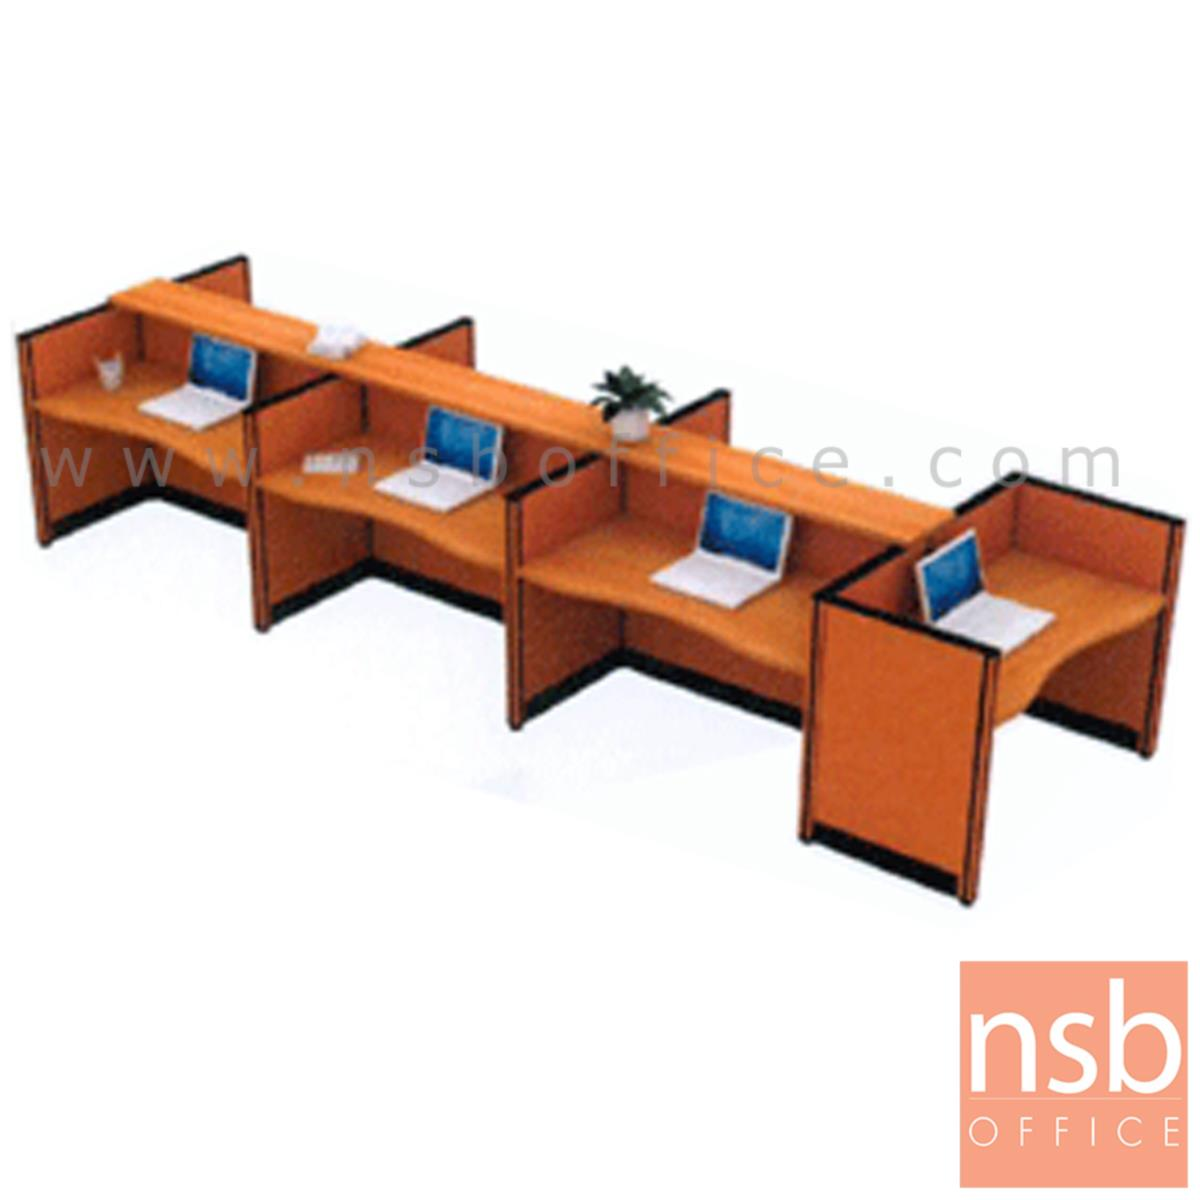 A04A053:ชุดโต๊ะทำงานกลุ่ม 7 ที่นั่ง   พร้อมที่วางของส่วนกลาง